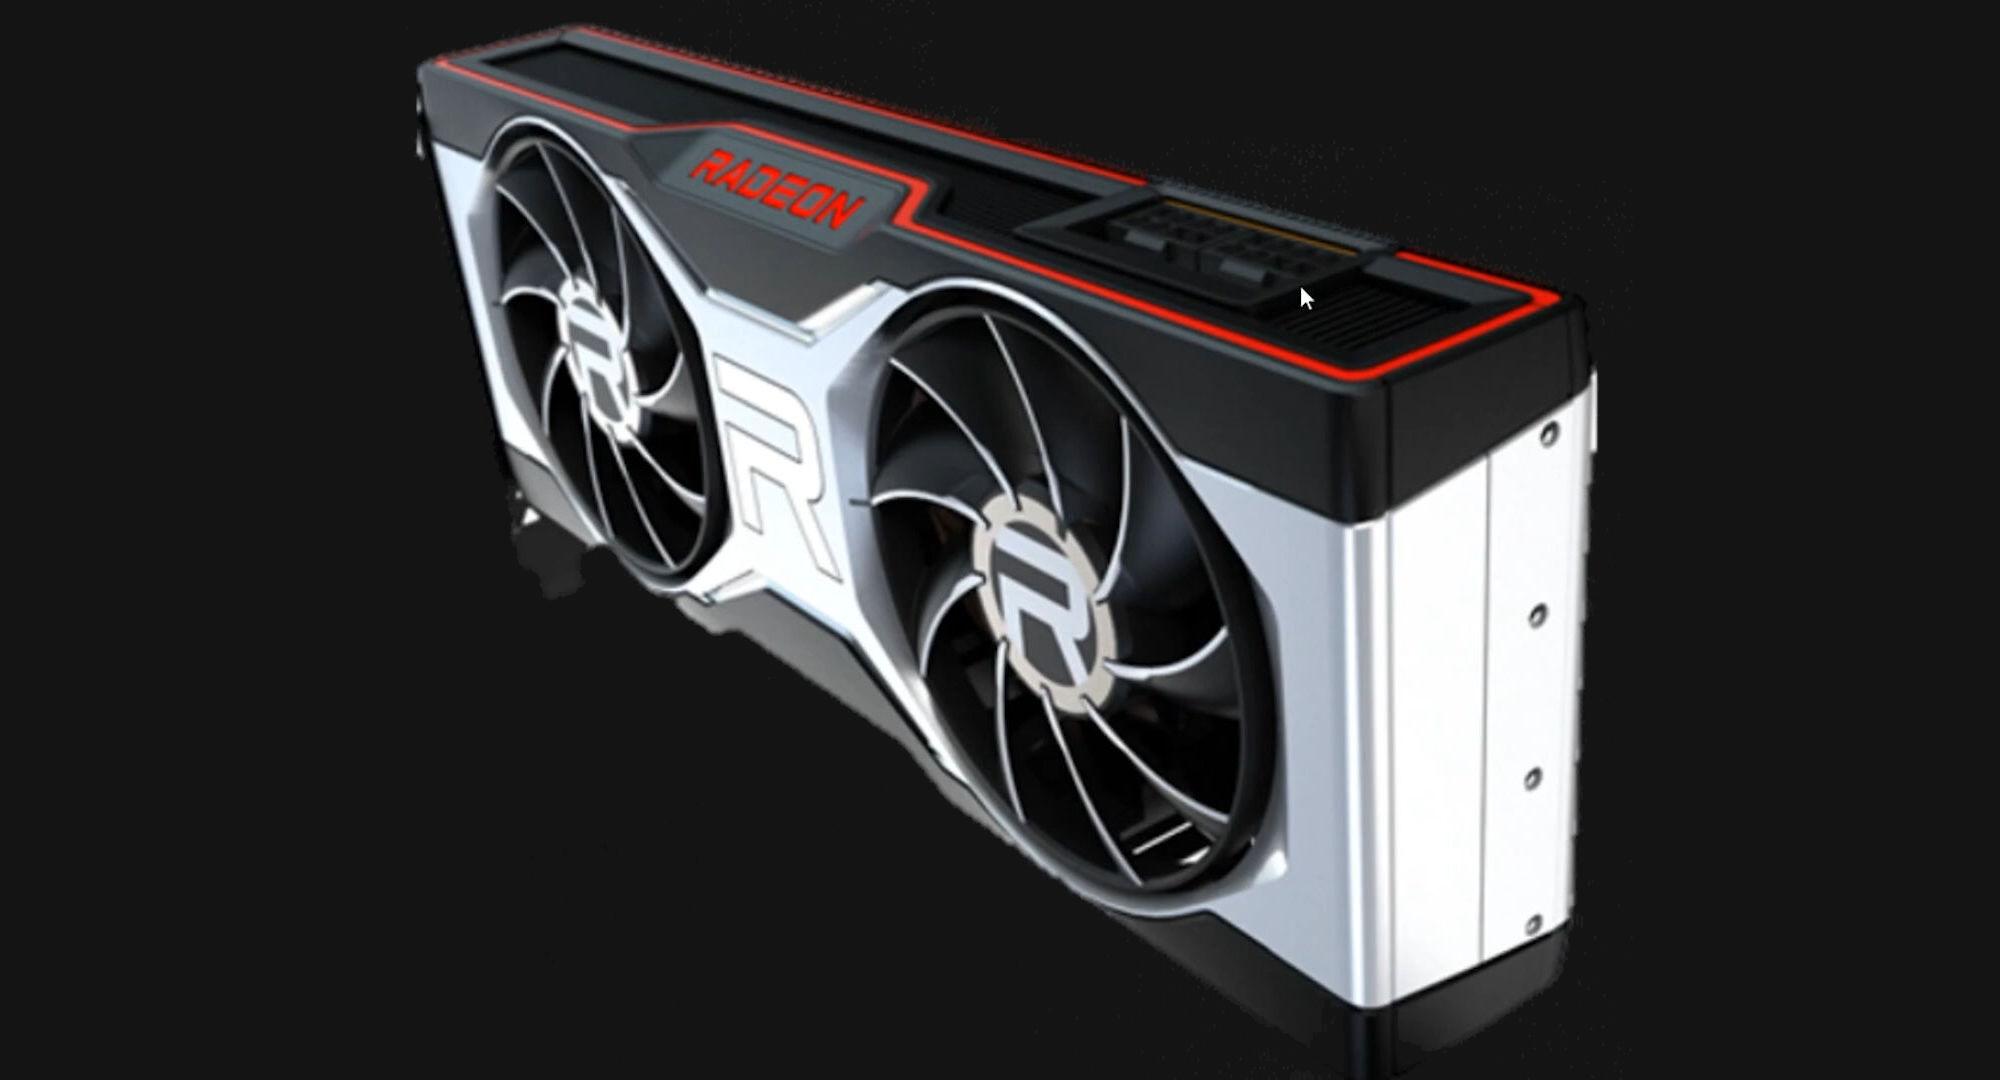 https://www.coolaler.com.tw/image/news/20/11/AMD-Radeon-RX-6700-Series.jpg